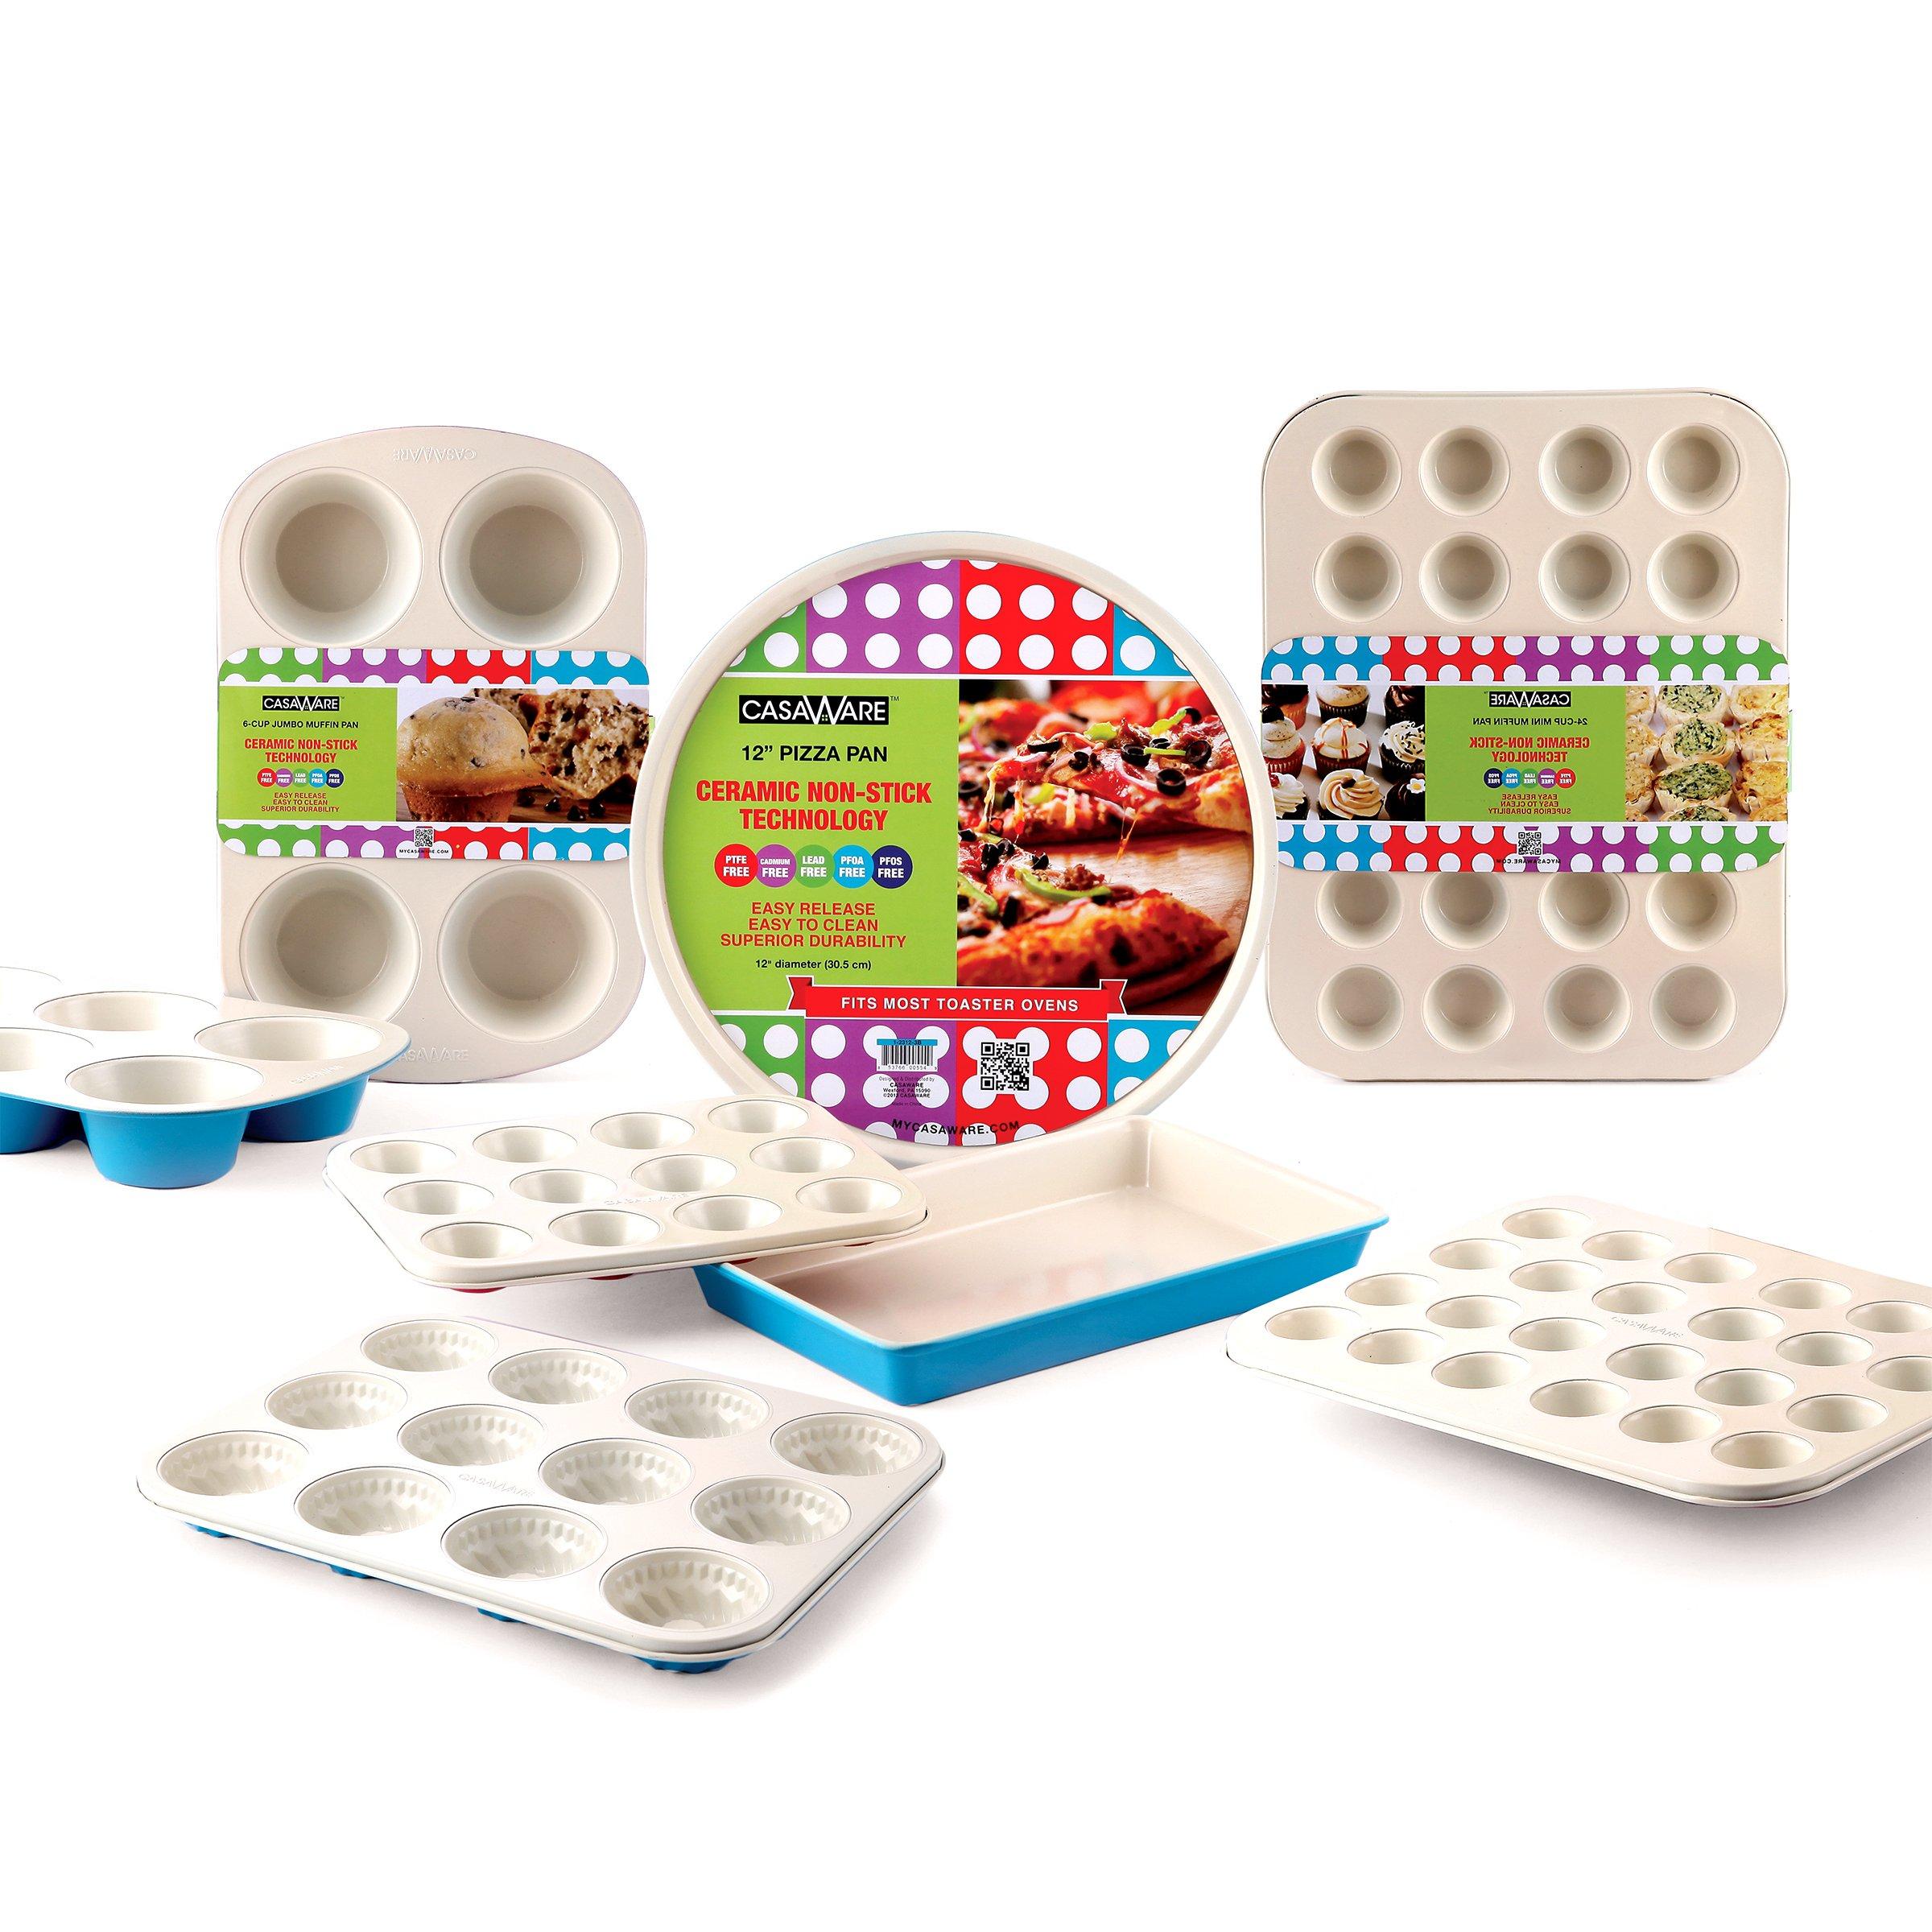 casaWare Ceramic Coated Non-Stick 12-Inch Pizza Pan (Cream/Blue) by casaWare (Image #4)